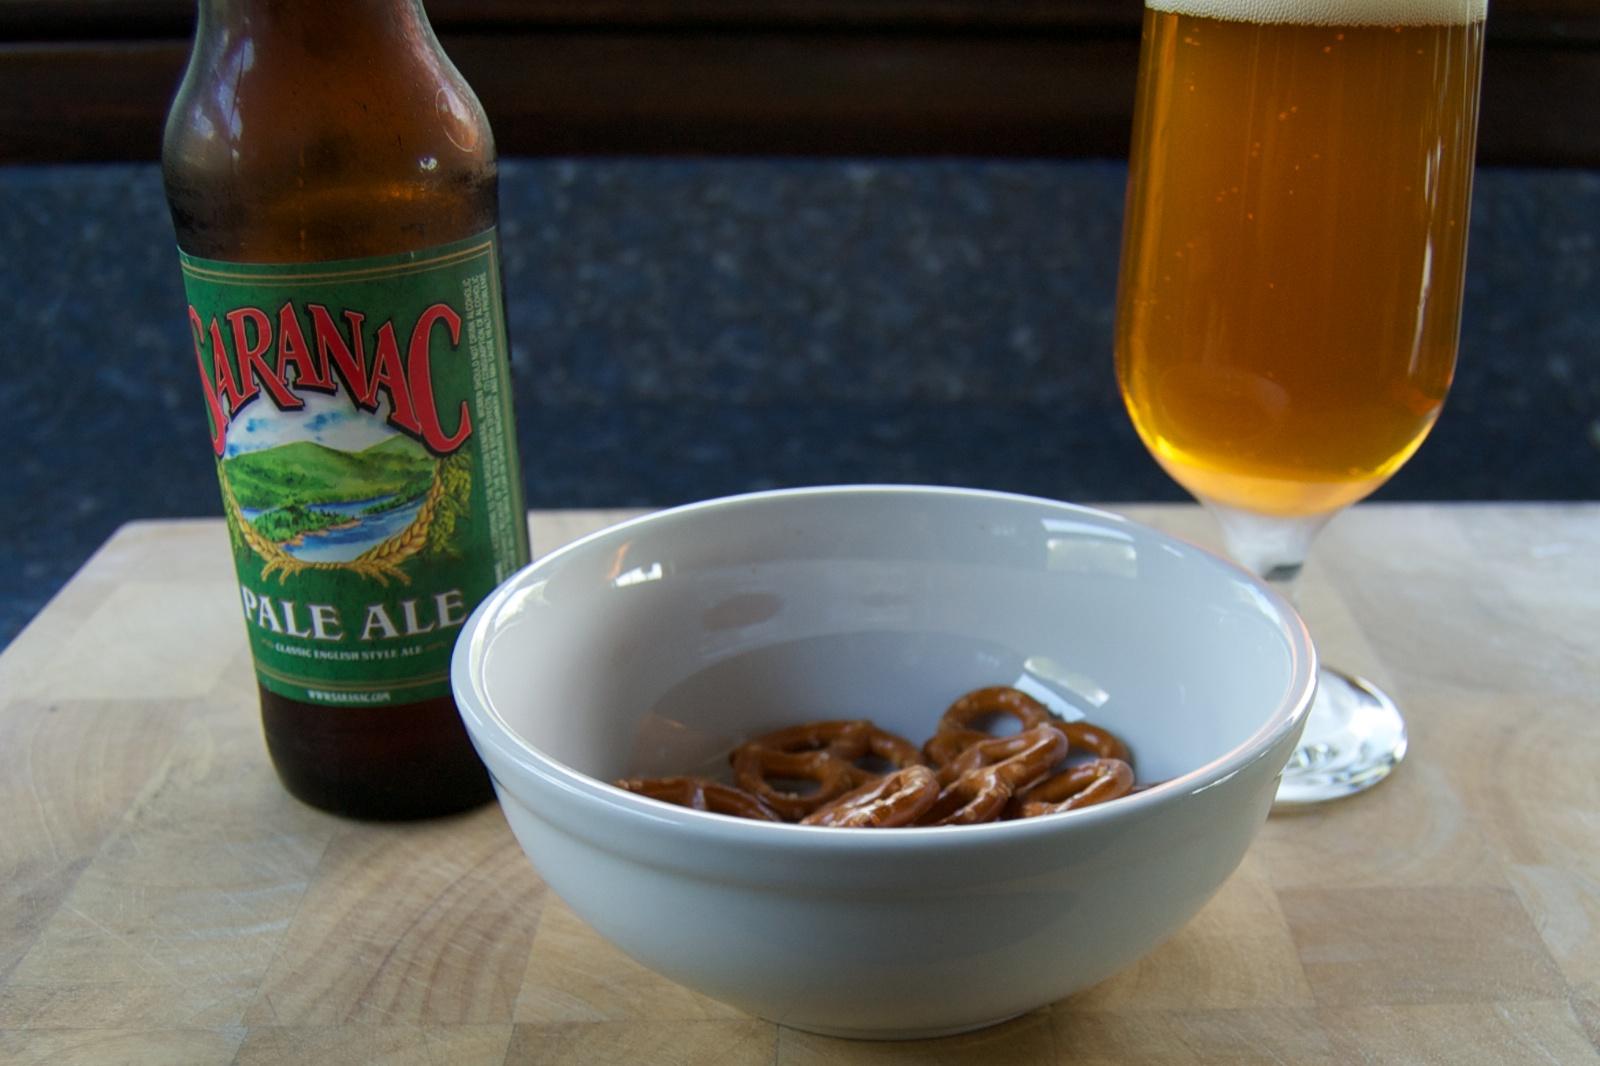 http://blog.rickk.com/food/2012/08/11/ate.2012.08.11.s1.jpg